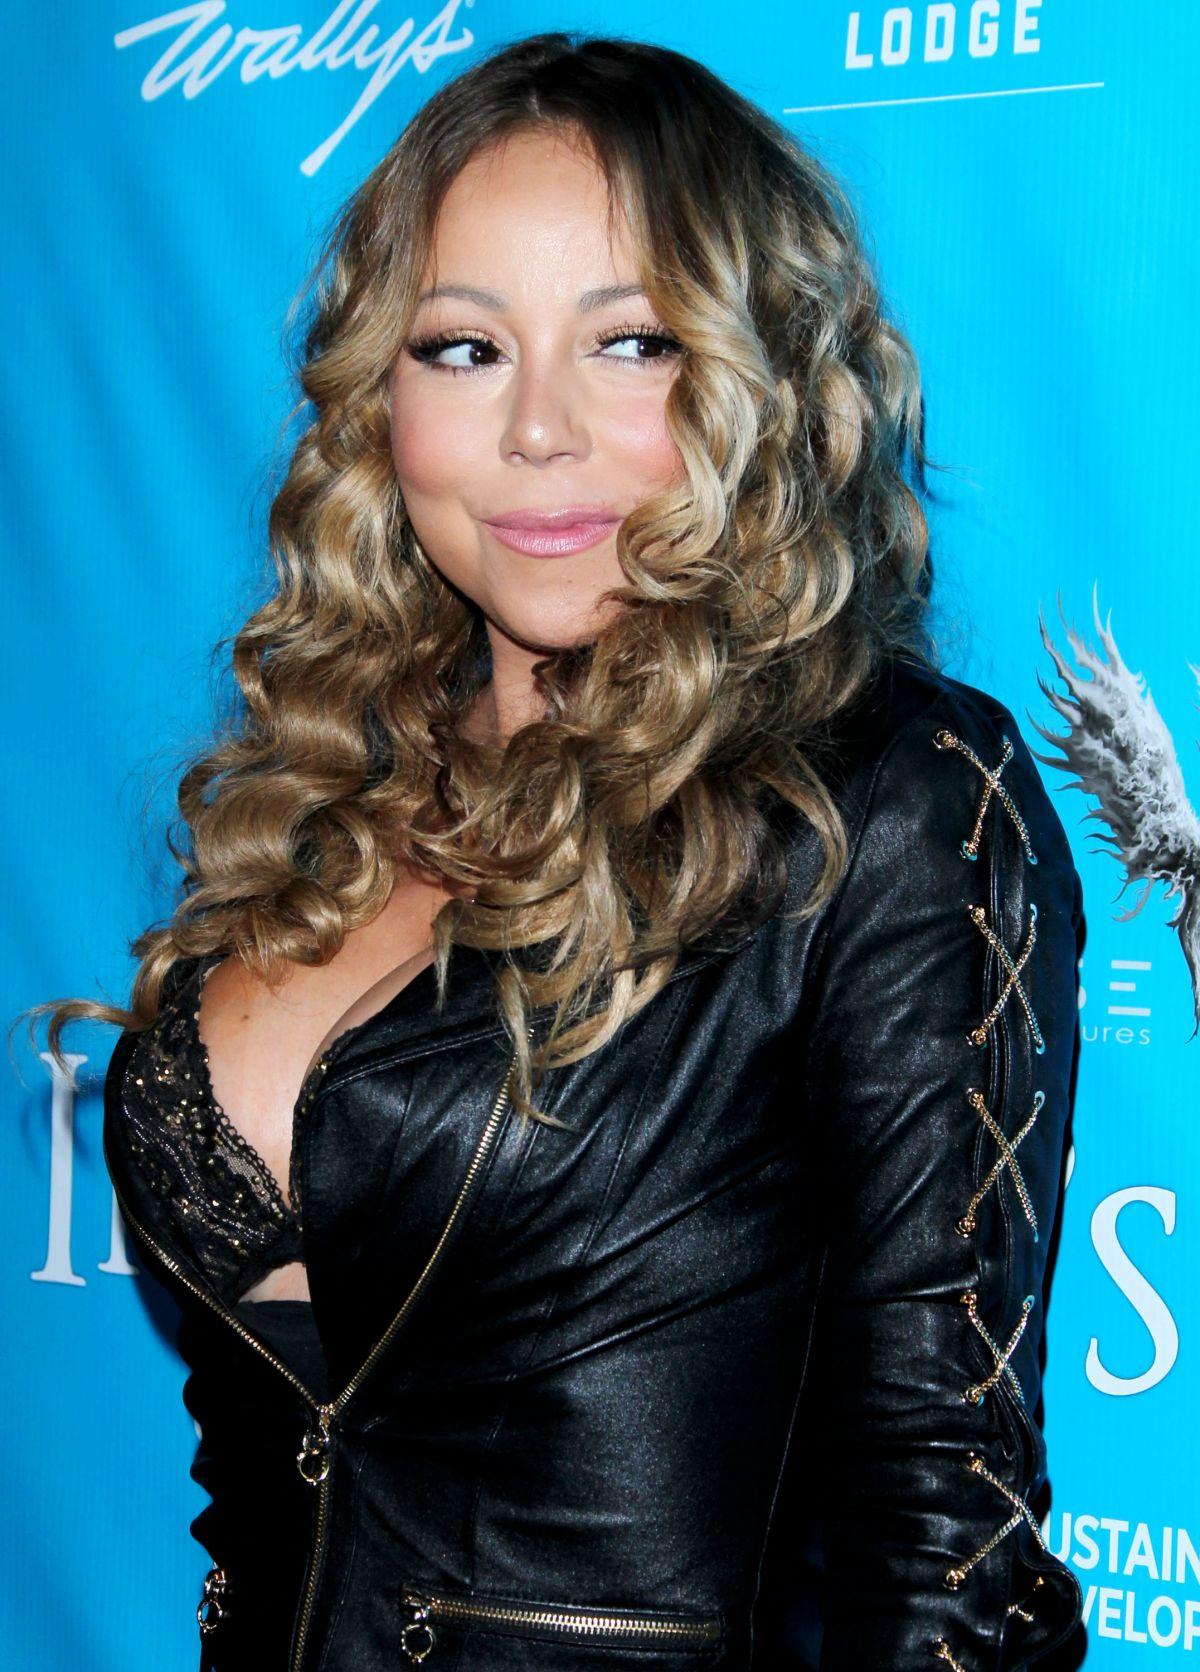 MARIAH CAREY at Harm's Way Foundation Gala 08/10/2016 ... Mariah Carey